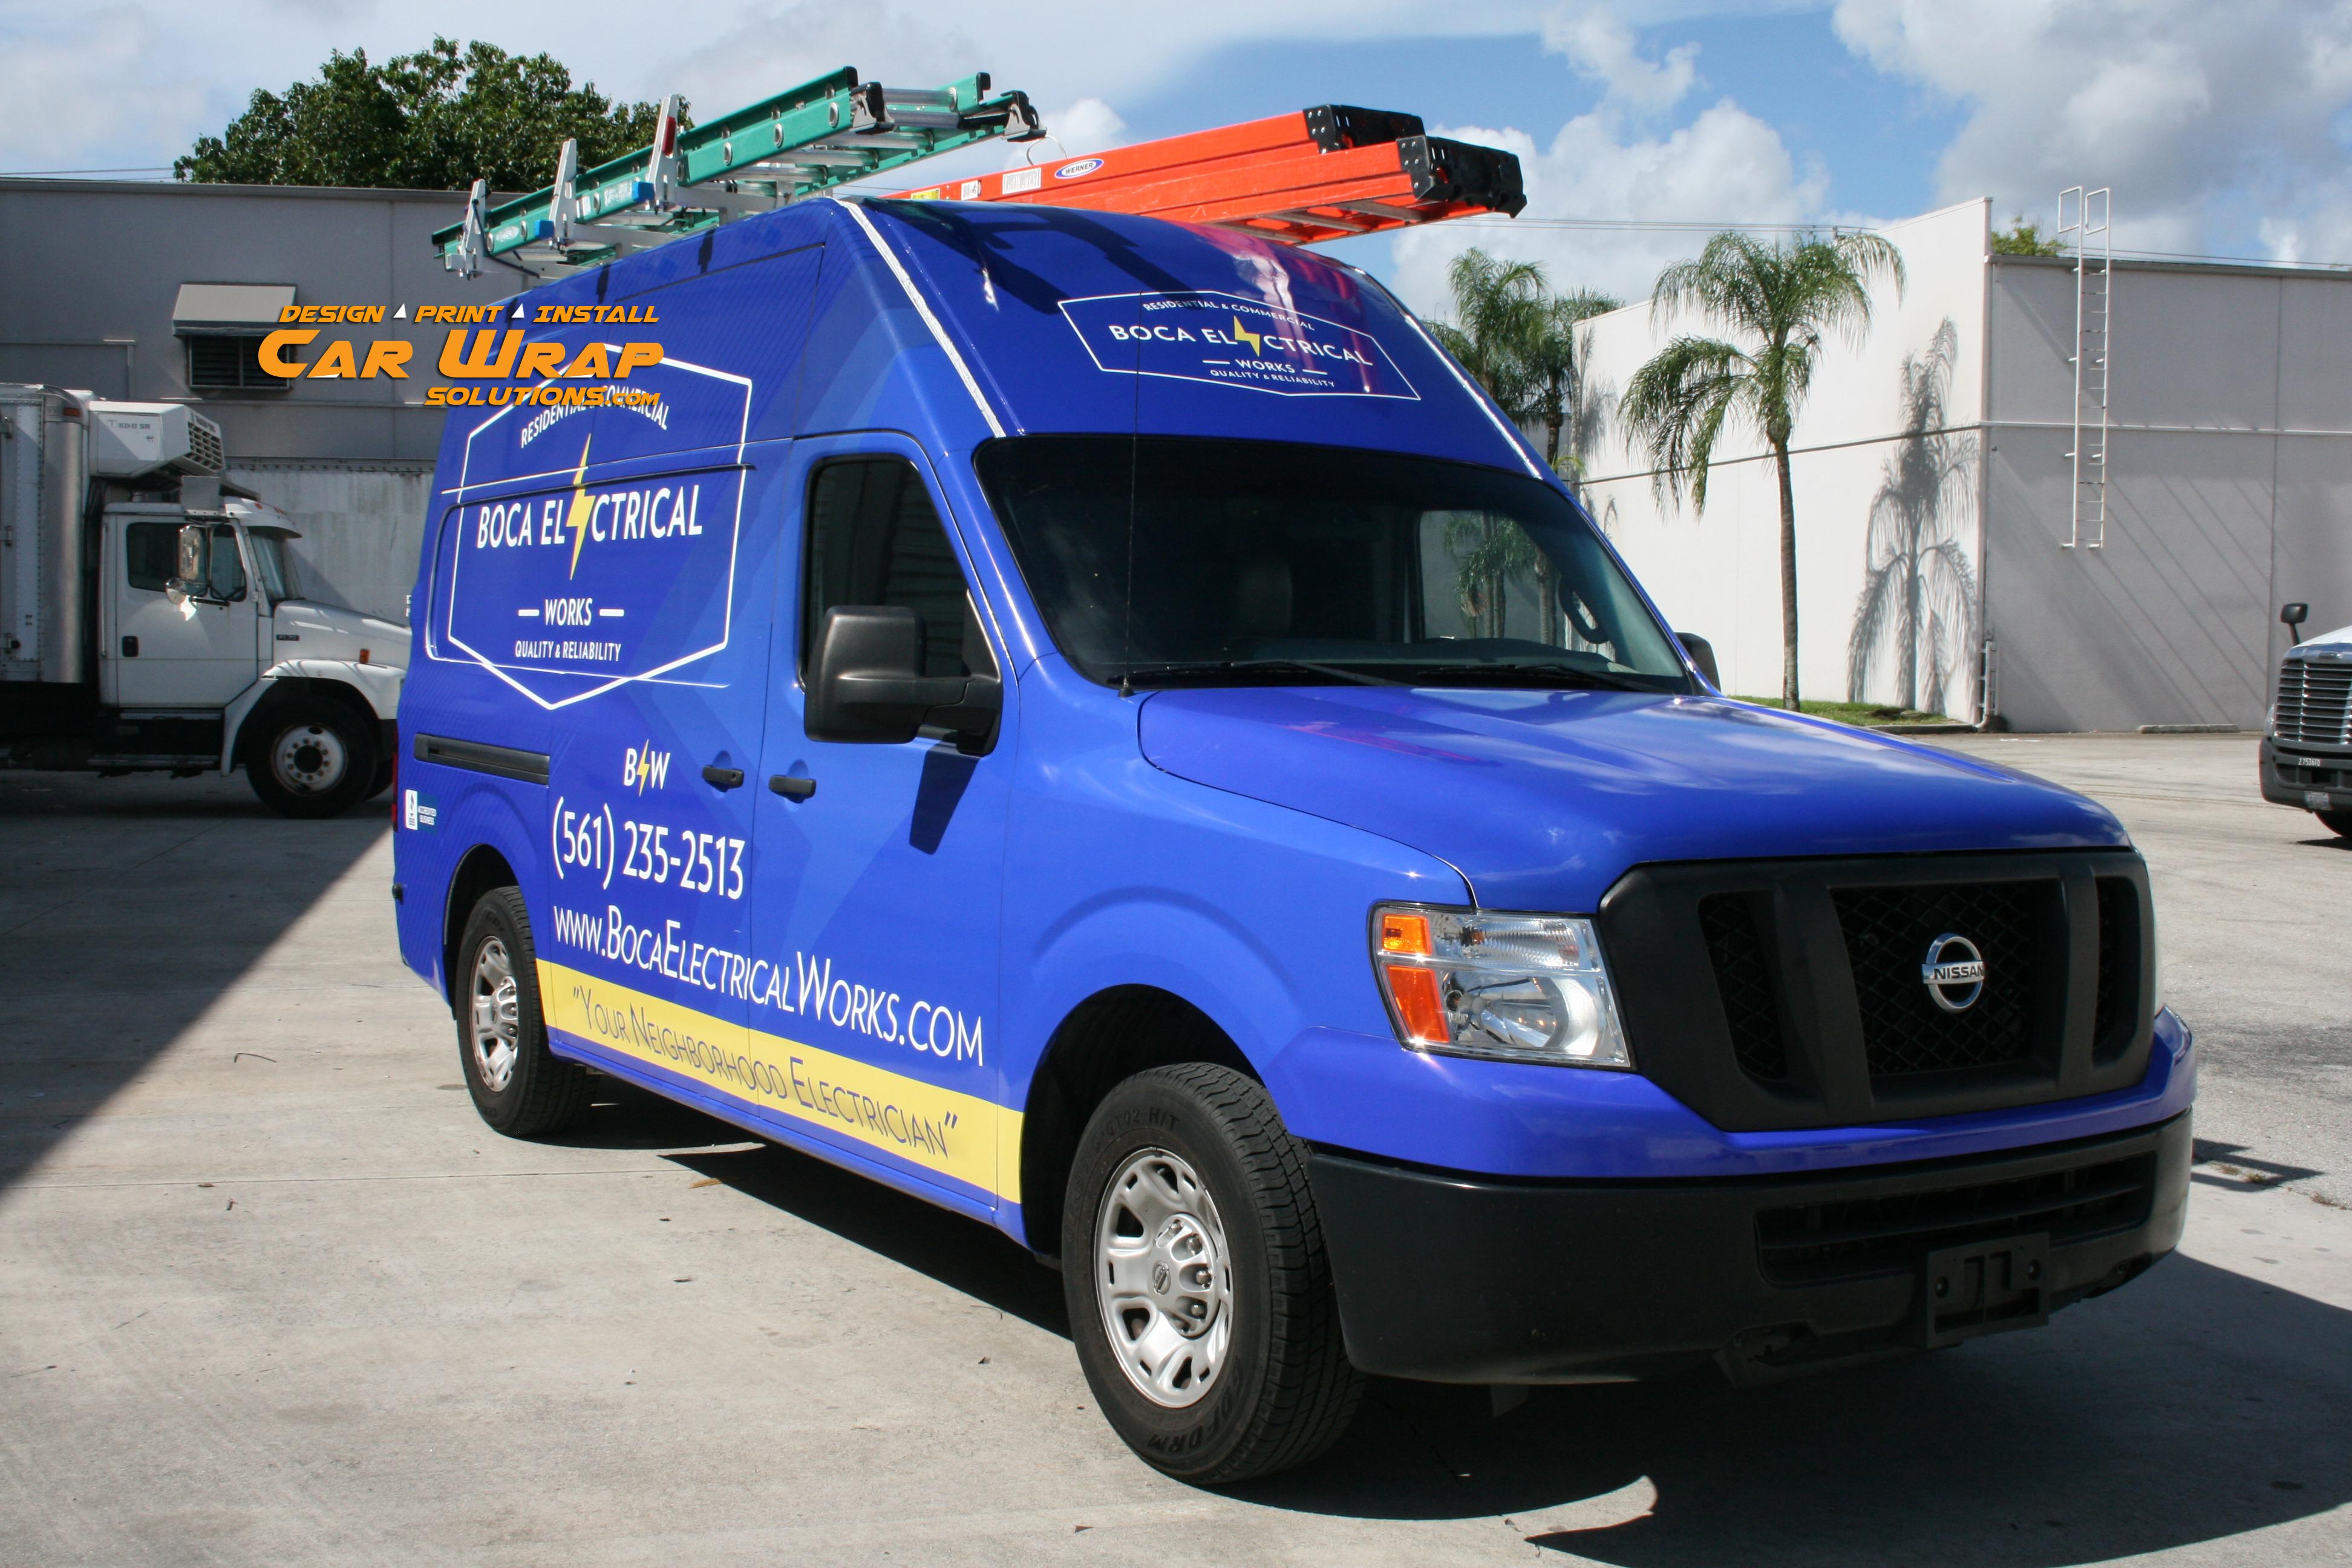 Car Wrap Solutions Nissan Nv Van Car Wrap Boca Raton Florida